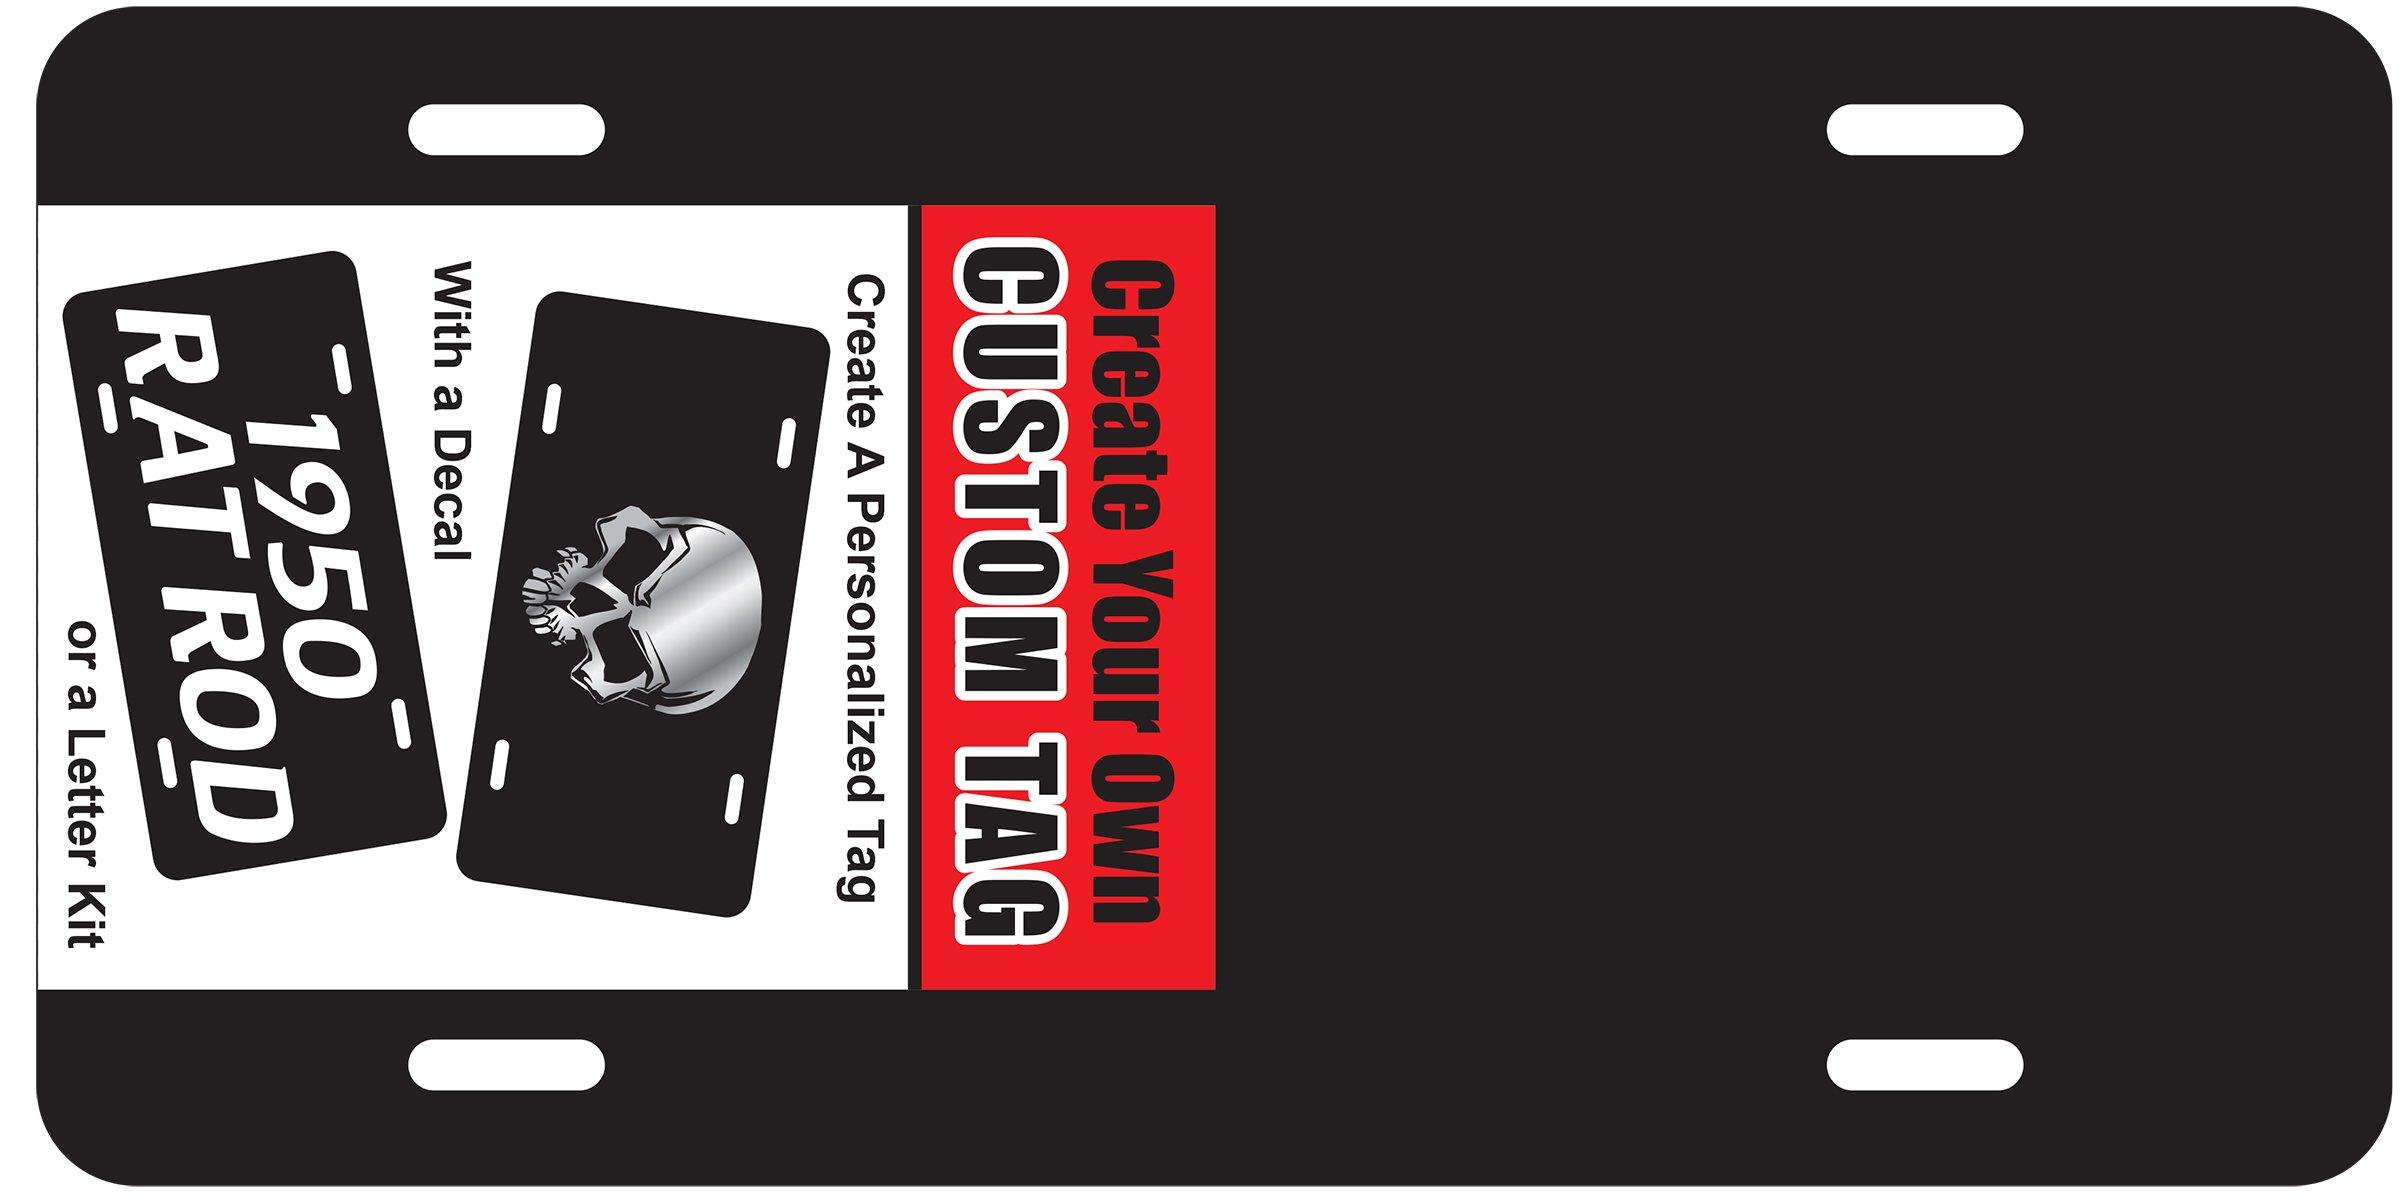 CHROMA 001438 Create Black License Plate by CHROMA (Image #2)